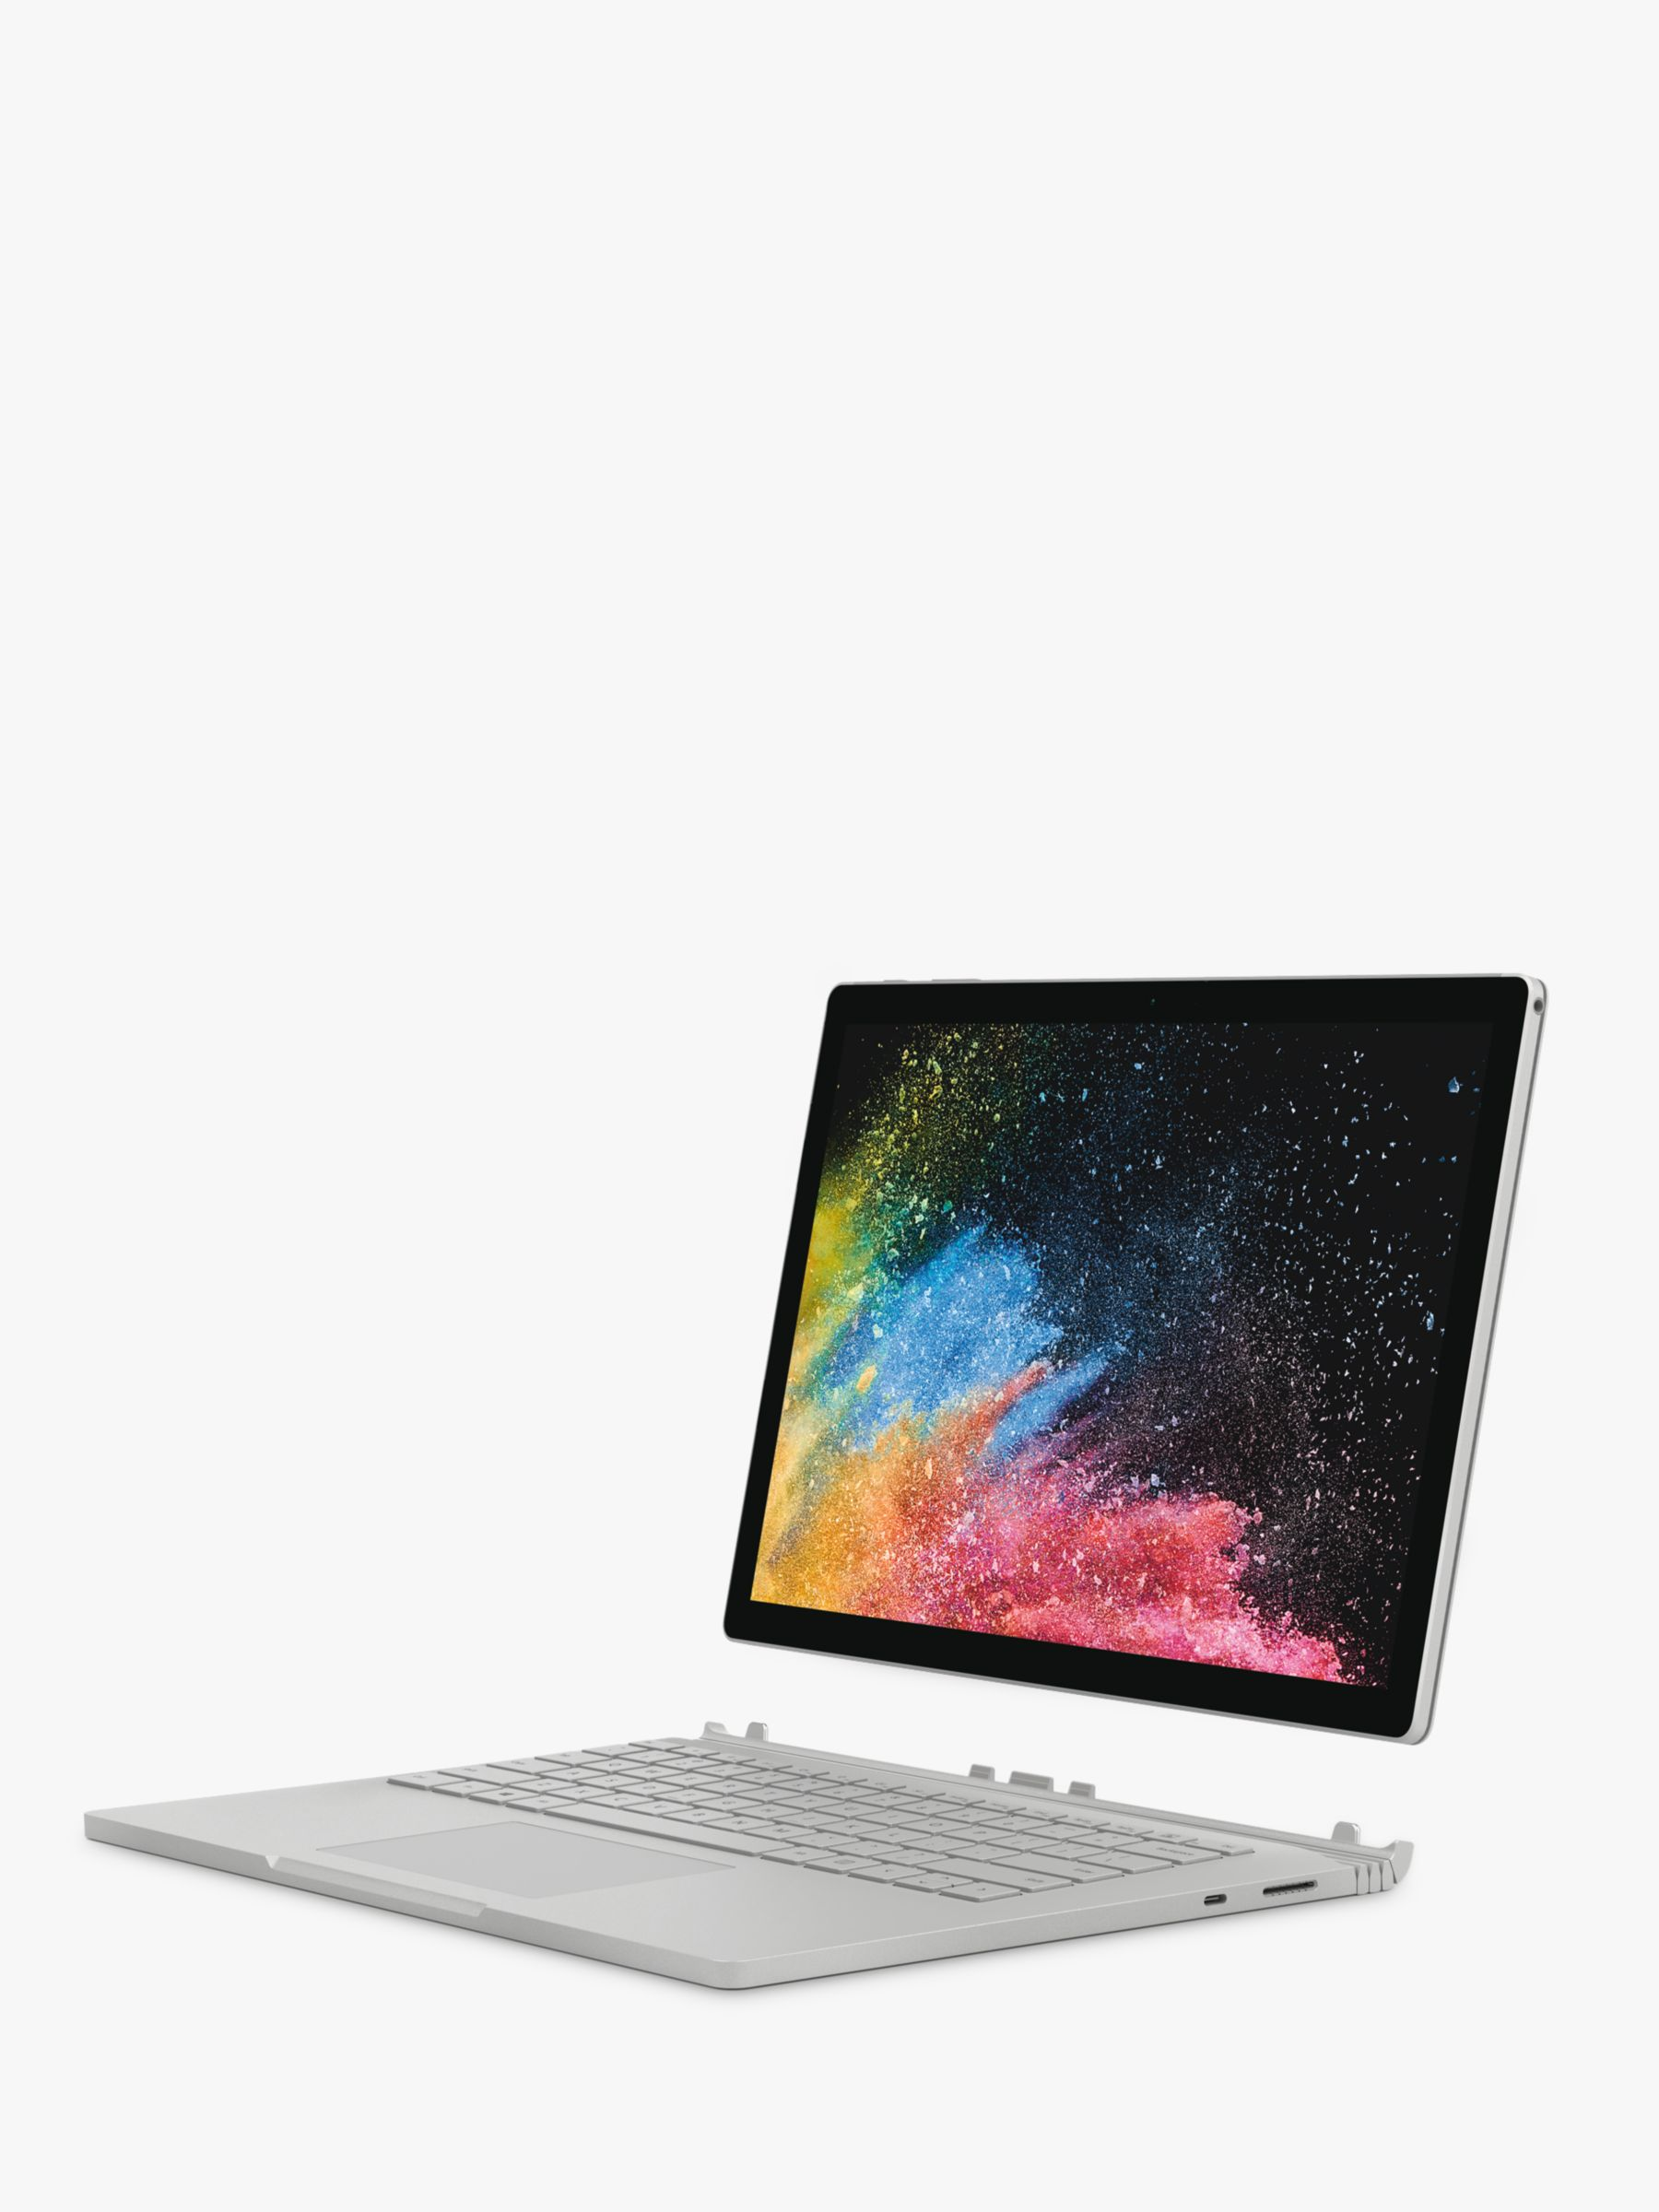 "Microsoft Microsoft Surface Book 2, Intel Core i7, 16GB RAM, 1TB SSD, 13.5"", PixelSense Display, Silver"